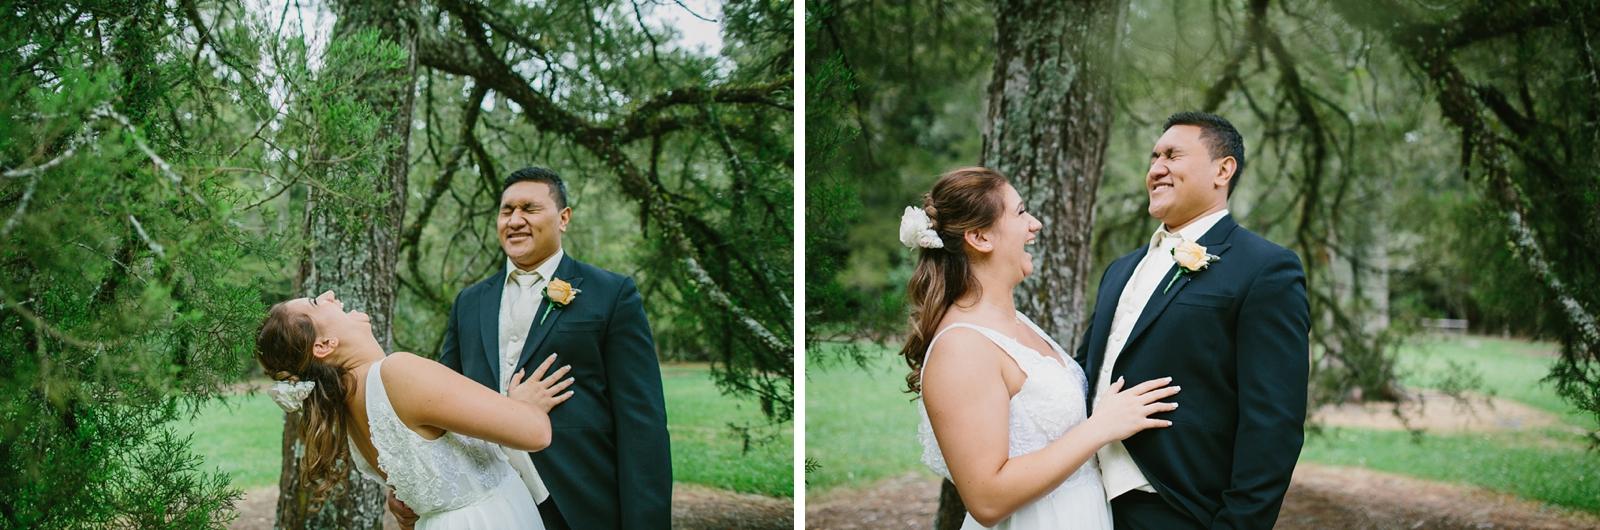 GabbyFiti_Auckland Wedding Photographer_Patty Lagera_0085.jpg